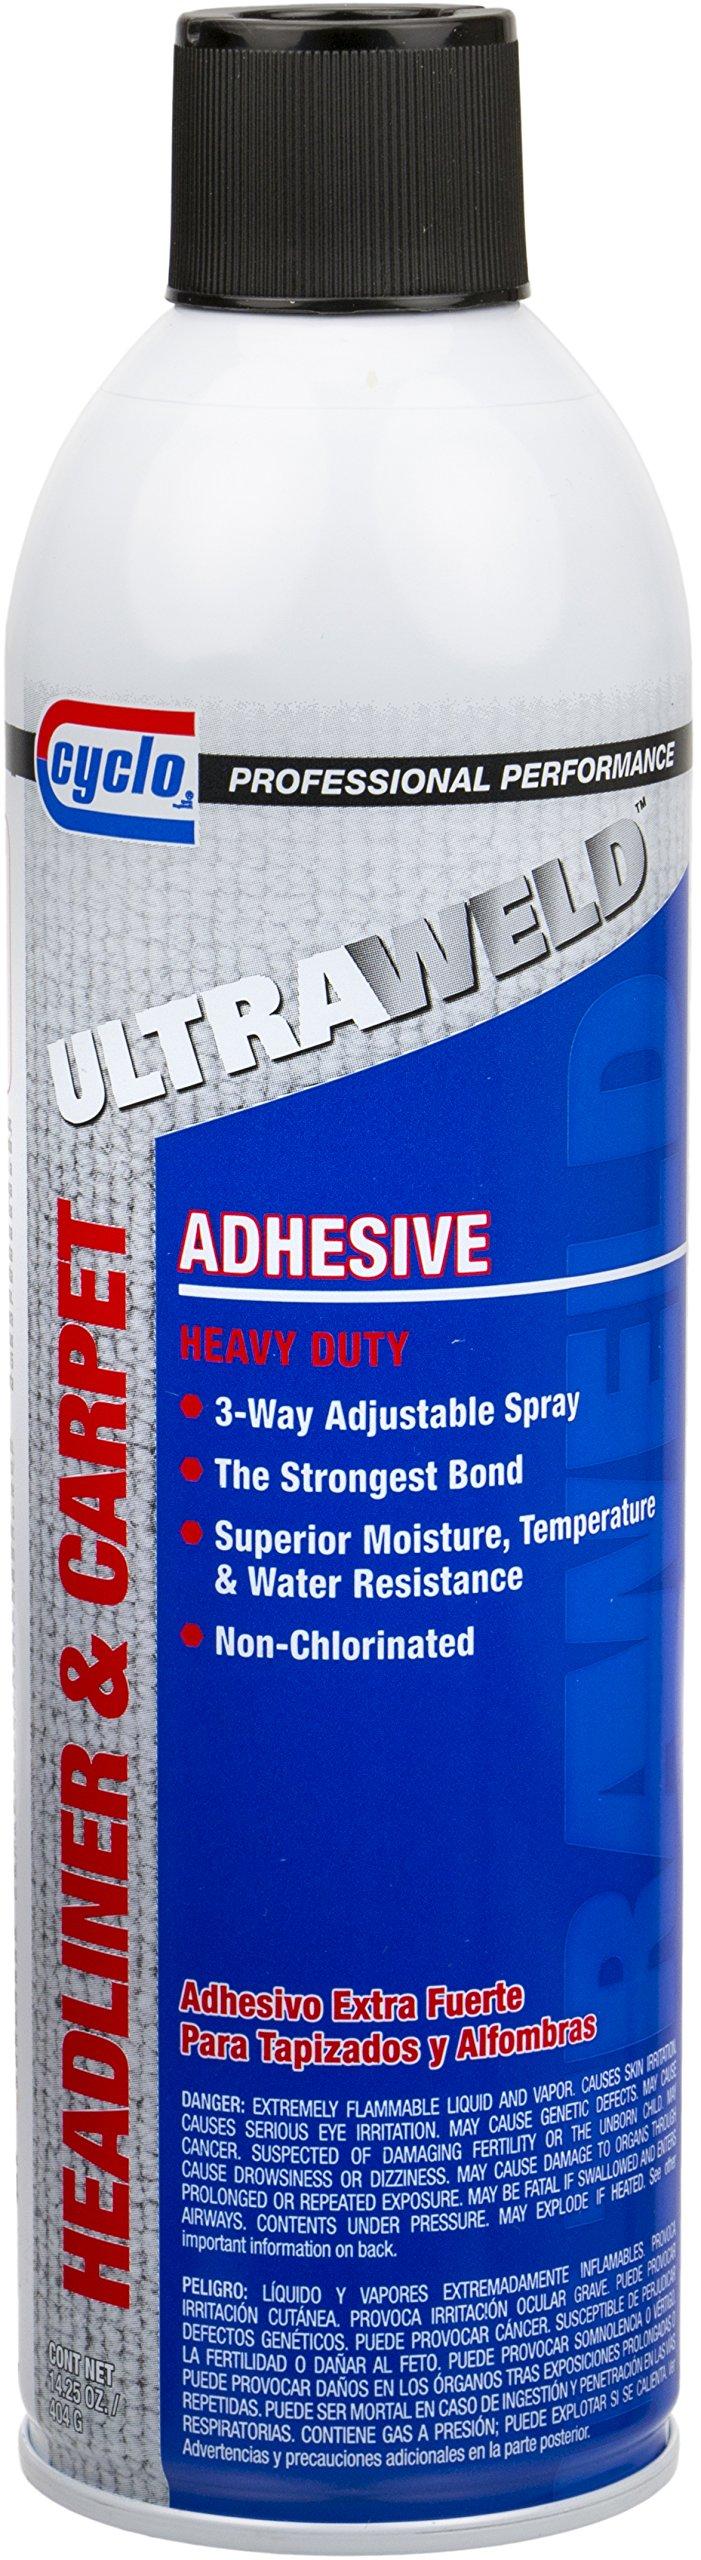 Niteo Cyclo ULTRAWELD Headliner & Carpet Adhesive, Aerosol Spray, 14.25 fl oz